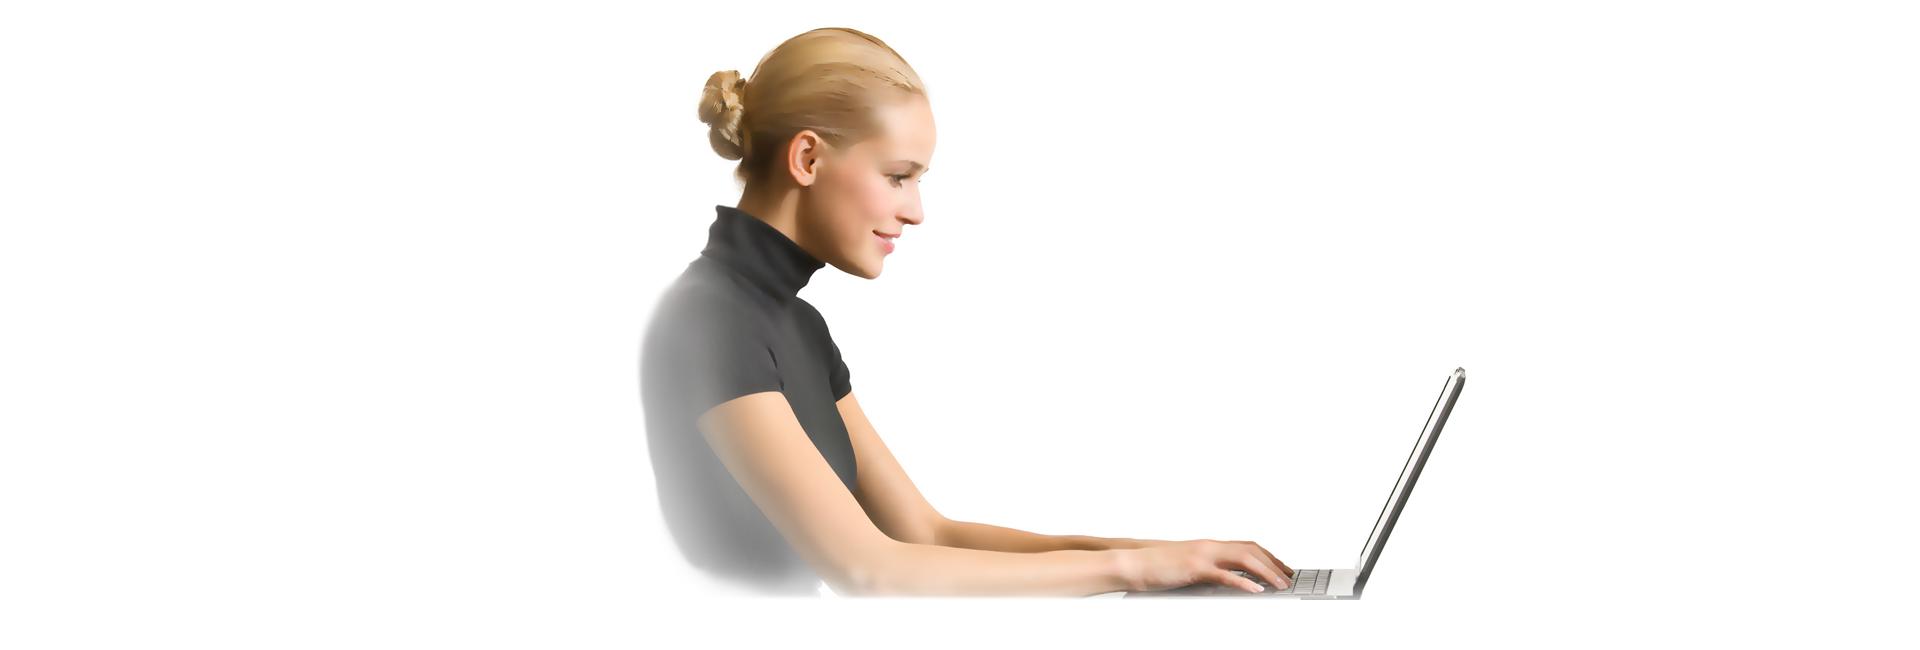 londoncityjob net jobs in london an online recruitment career articles about job